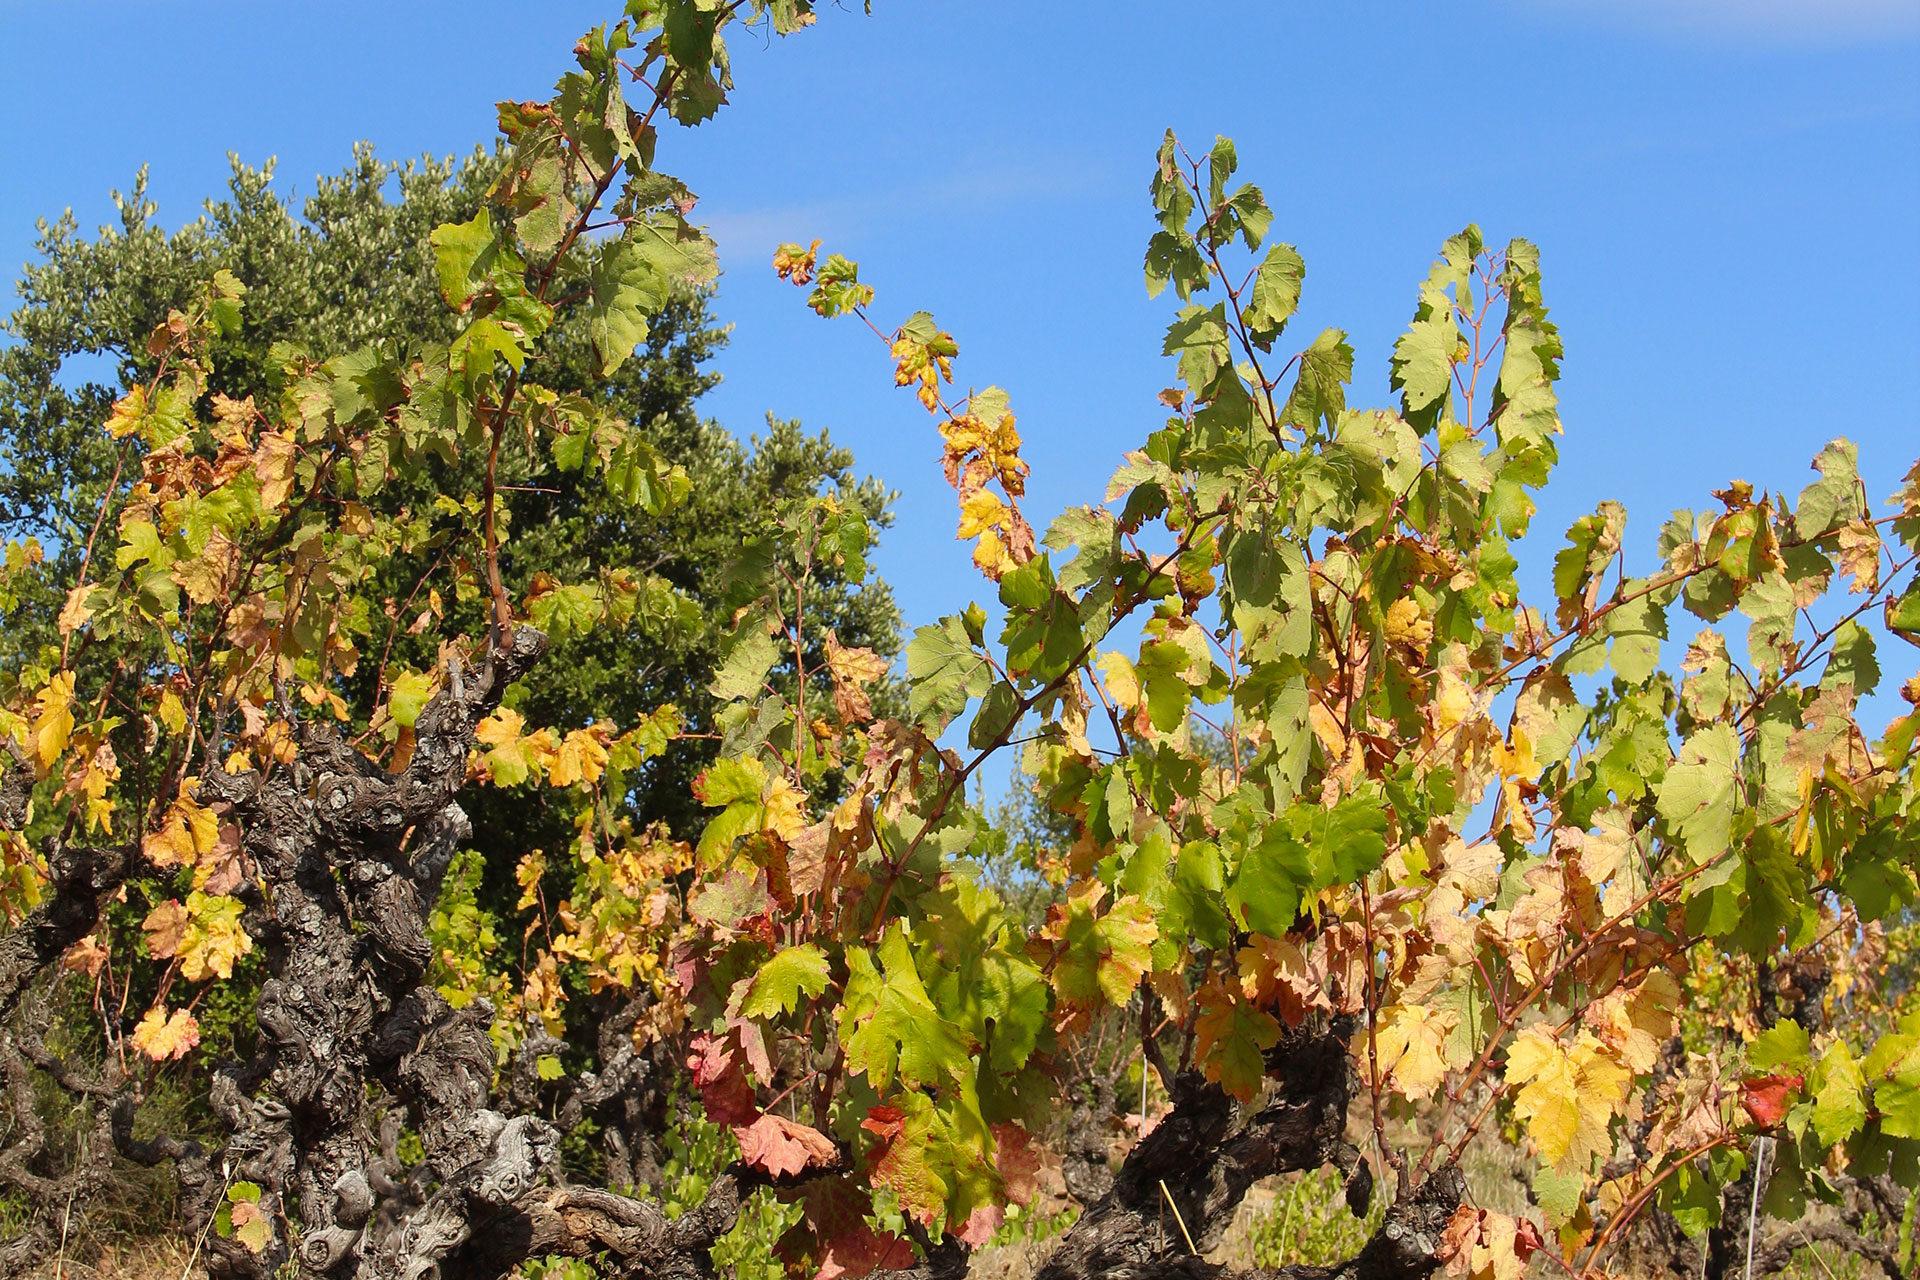 Magnifique-vignes-Madame-de-ses-vignes